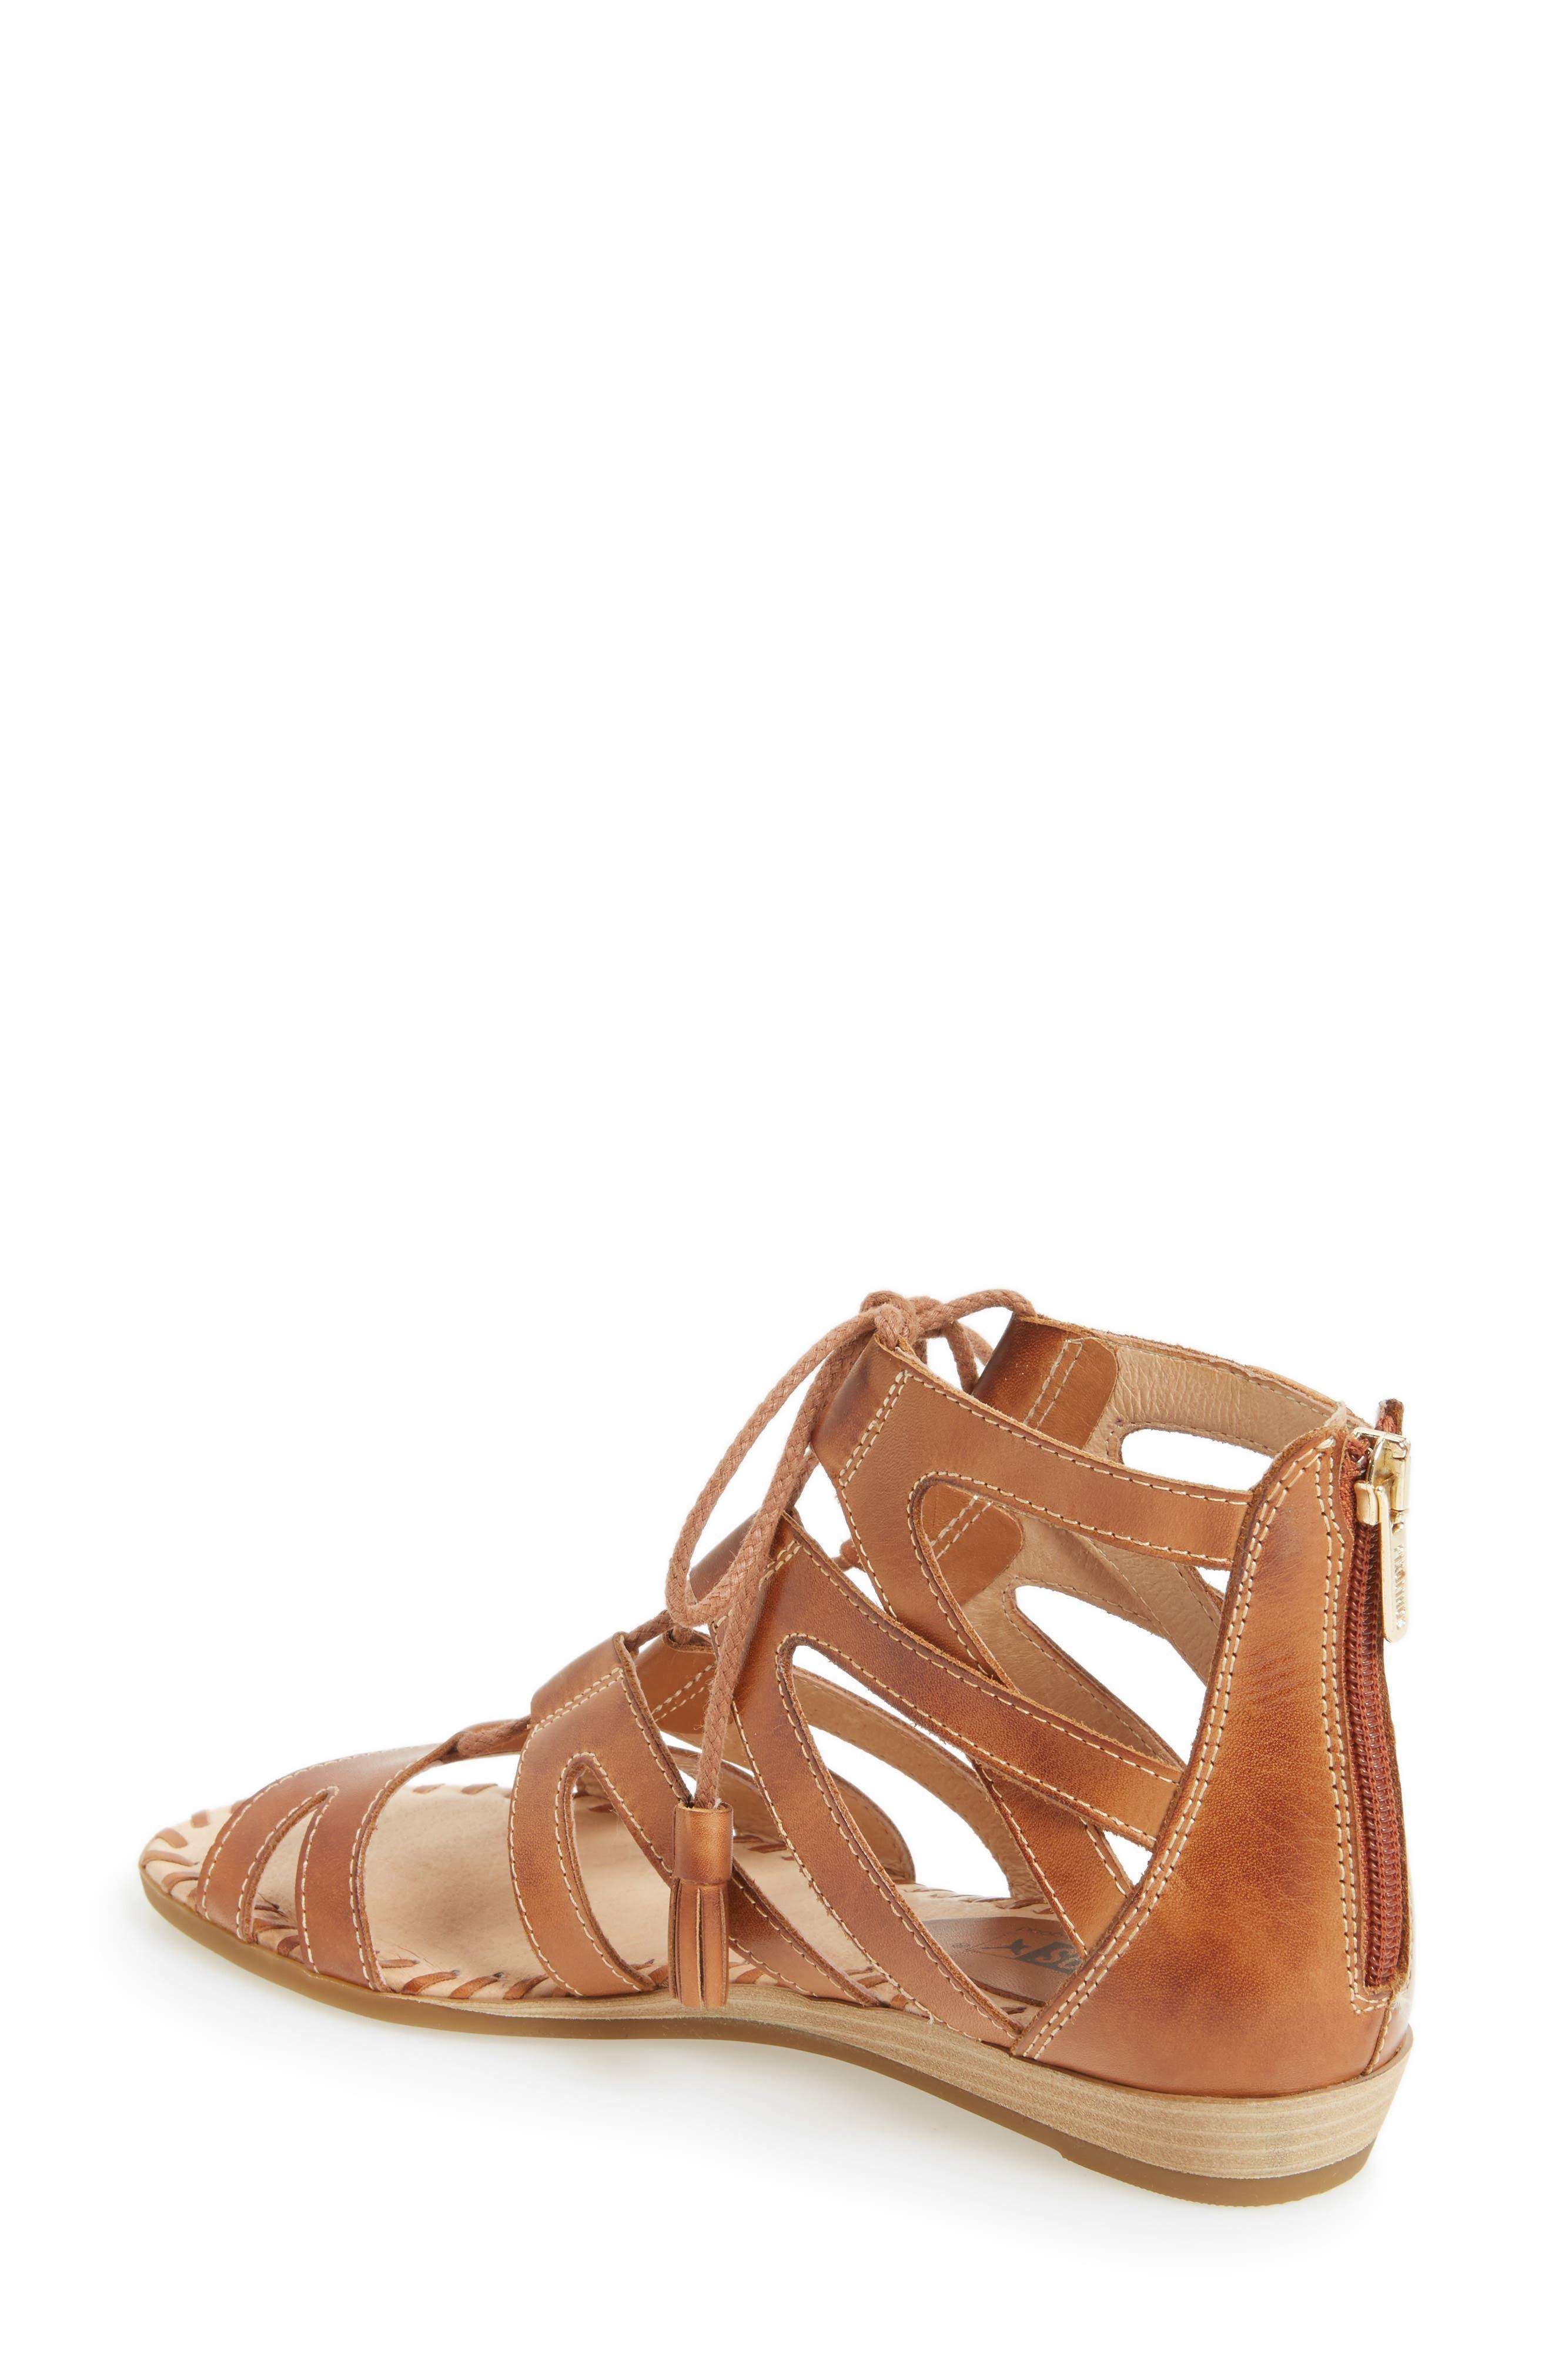 'Alcudia' Lace-Up Sandal,                             Alternate thumbnail 4, color,